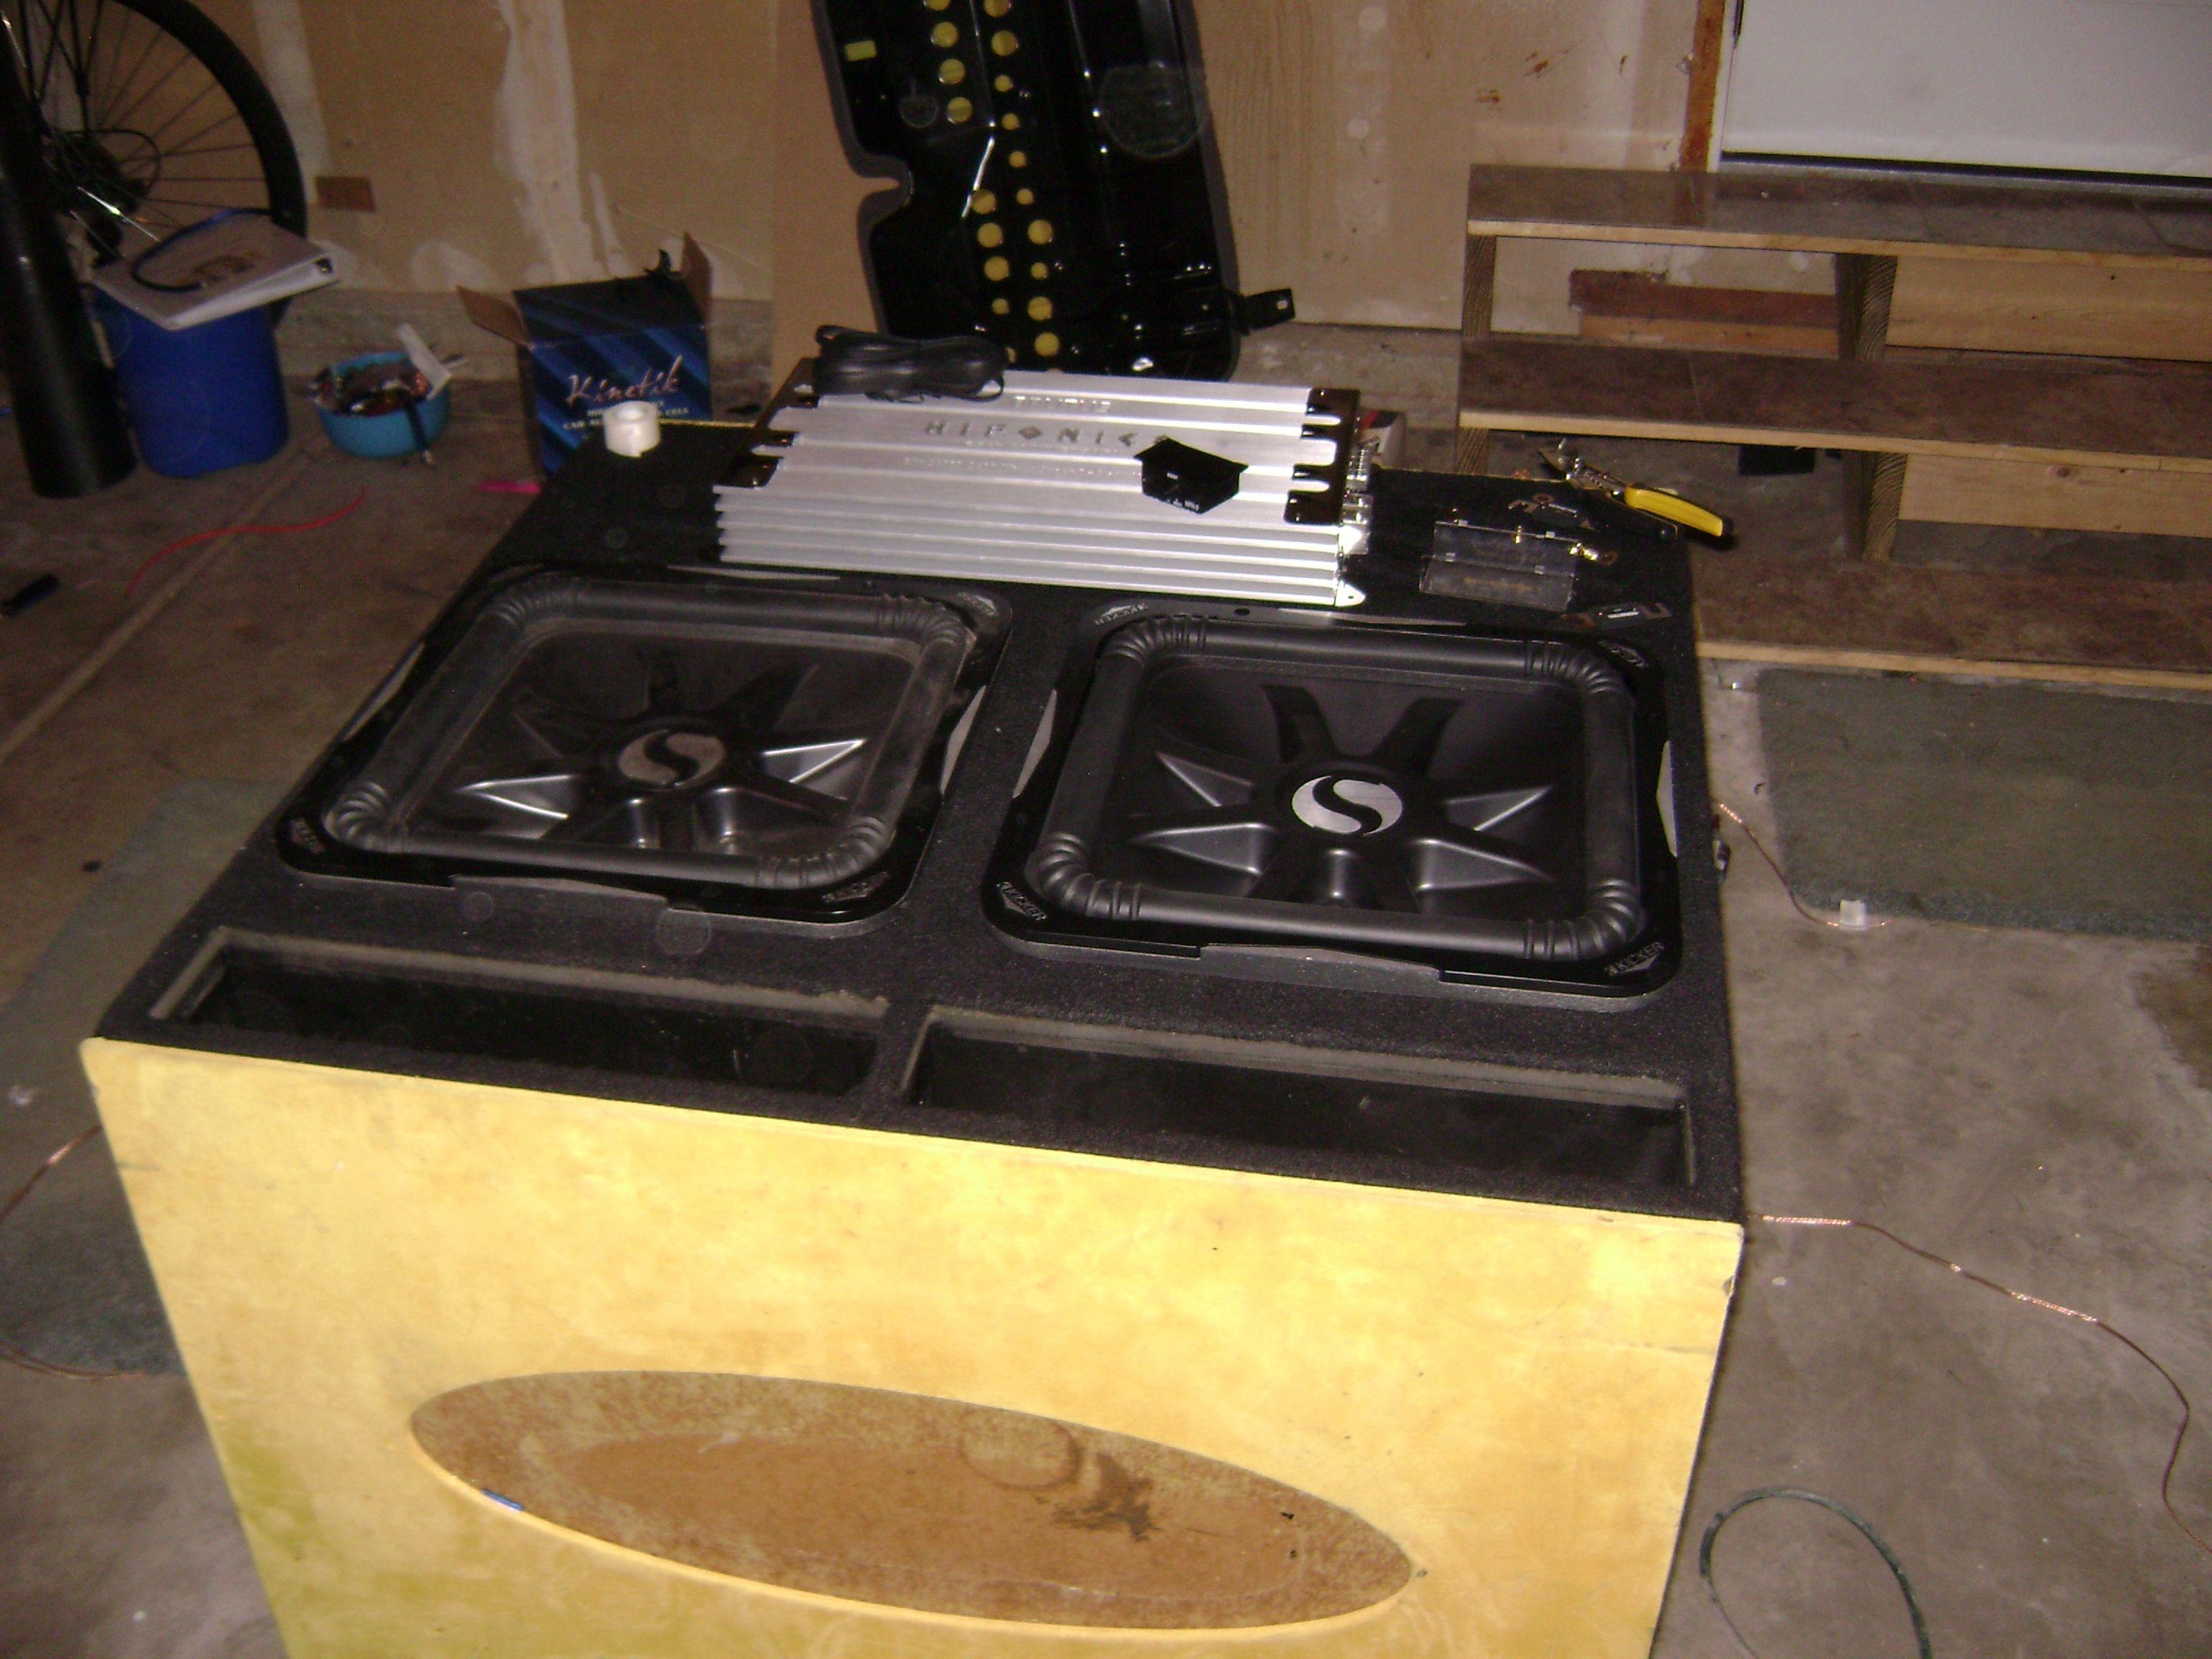 kicker cvr 15 wiring diagram 1996 jeep cherokee ignition switch subwoofer compvr l7 box